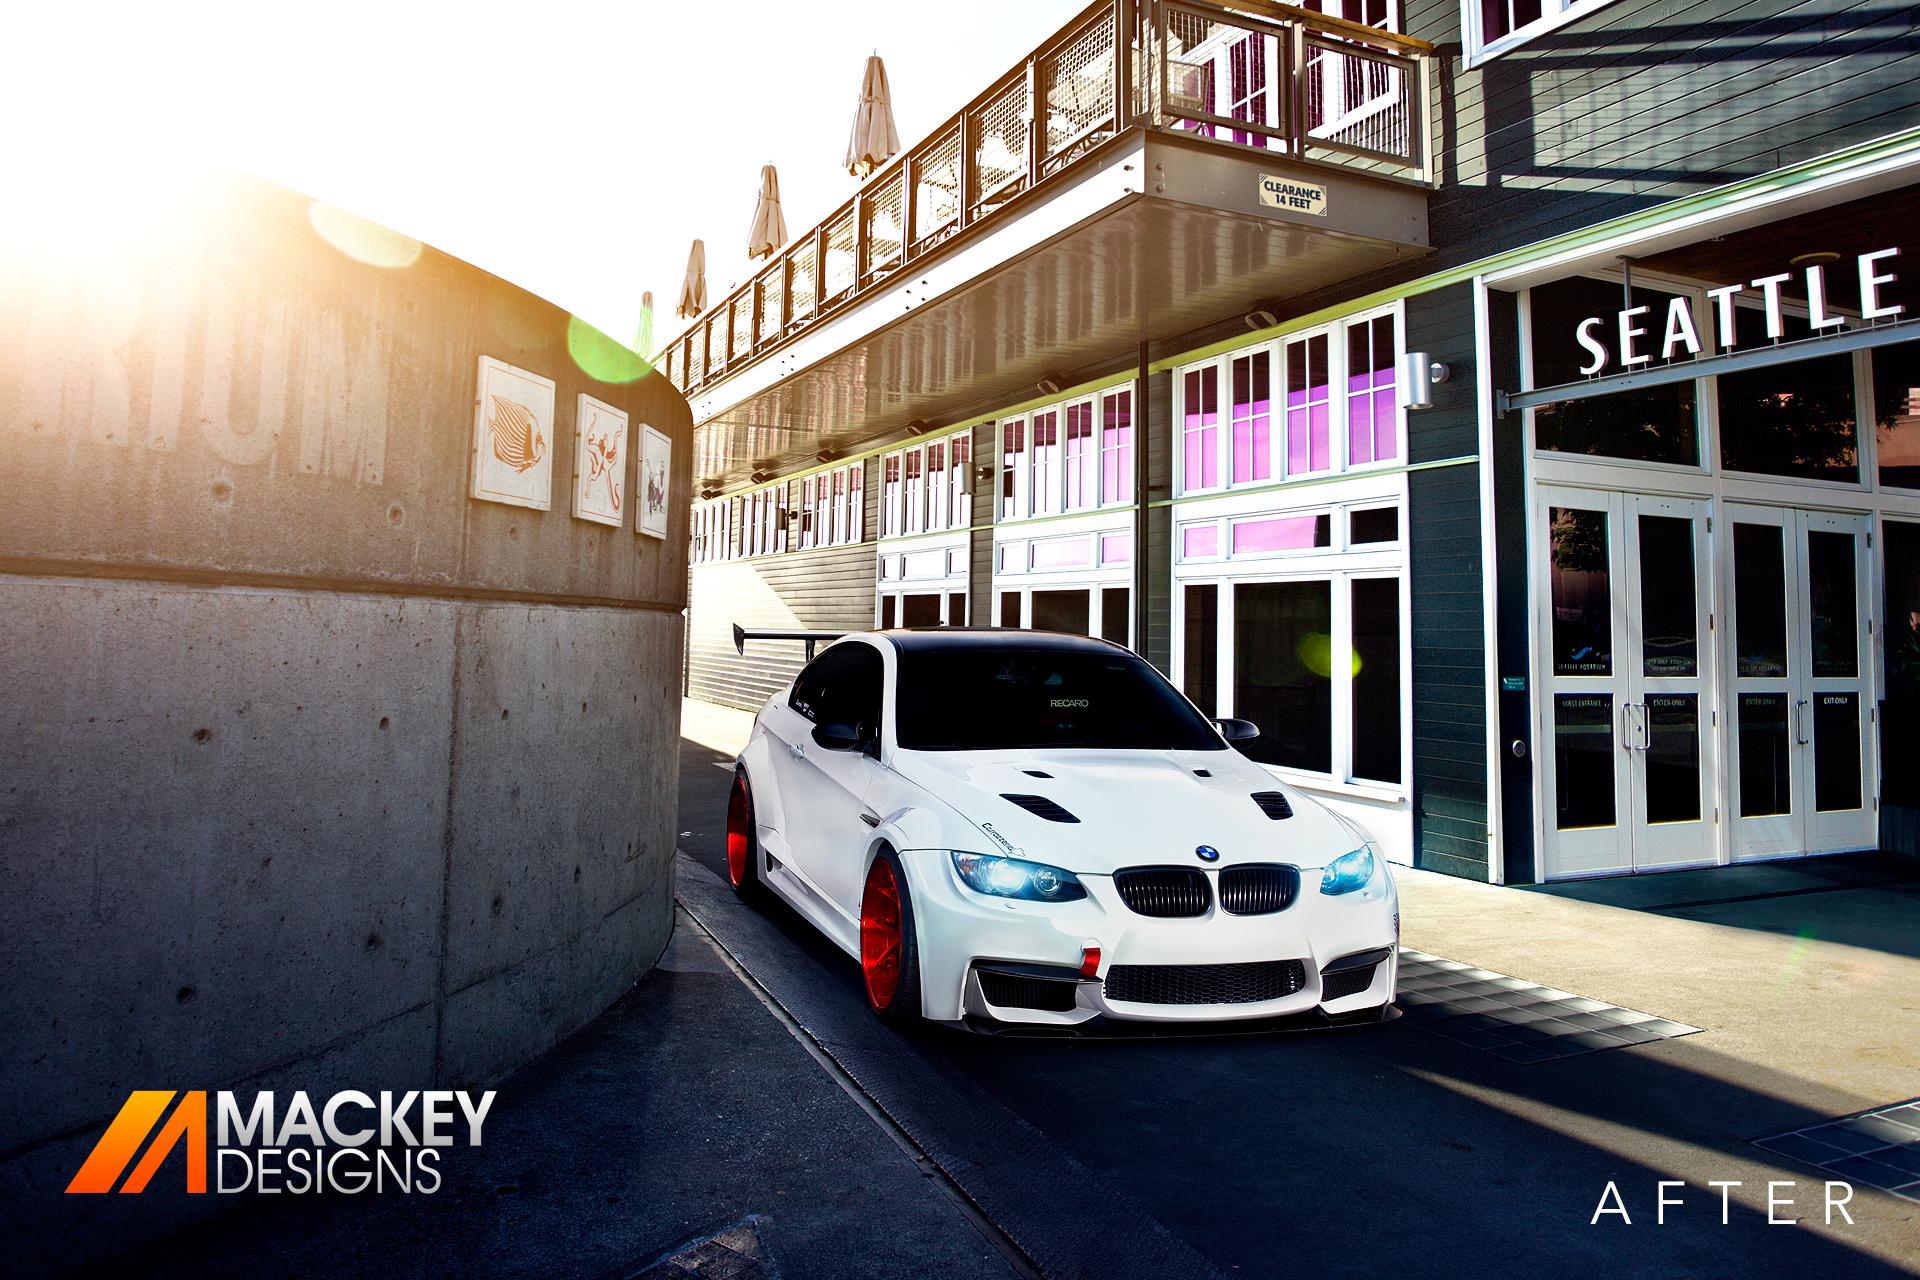 Automotive Photographer - Seattle - Josh Mackey - BMW M3 After